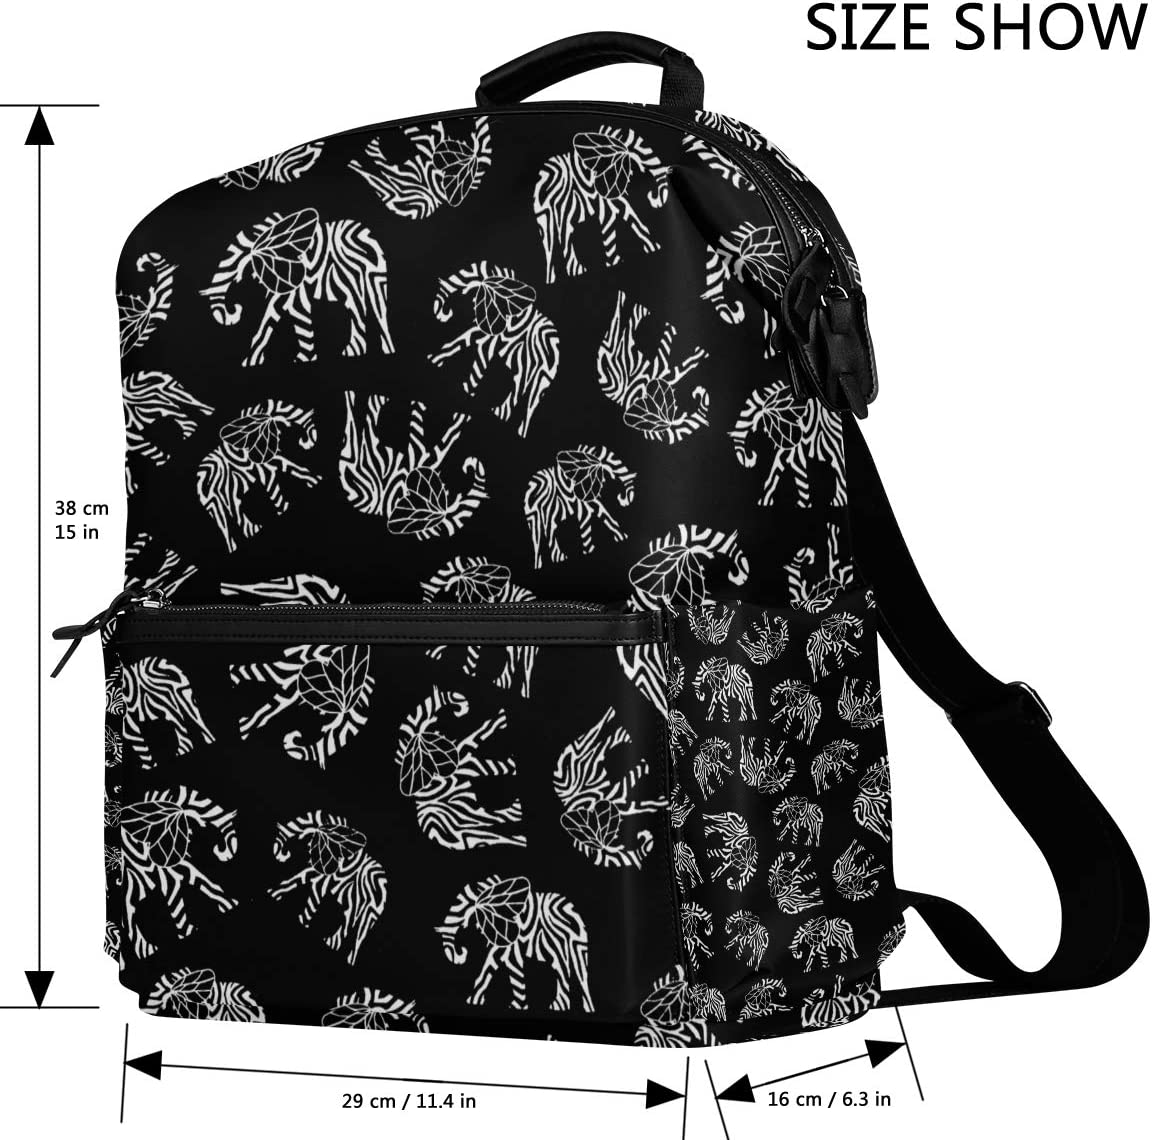 Backpack Rucksack Travel Daypack Stripe Elephant Book Bag Casual Travel Waterproof